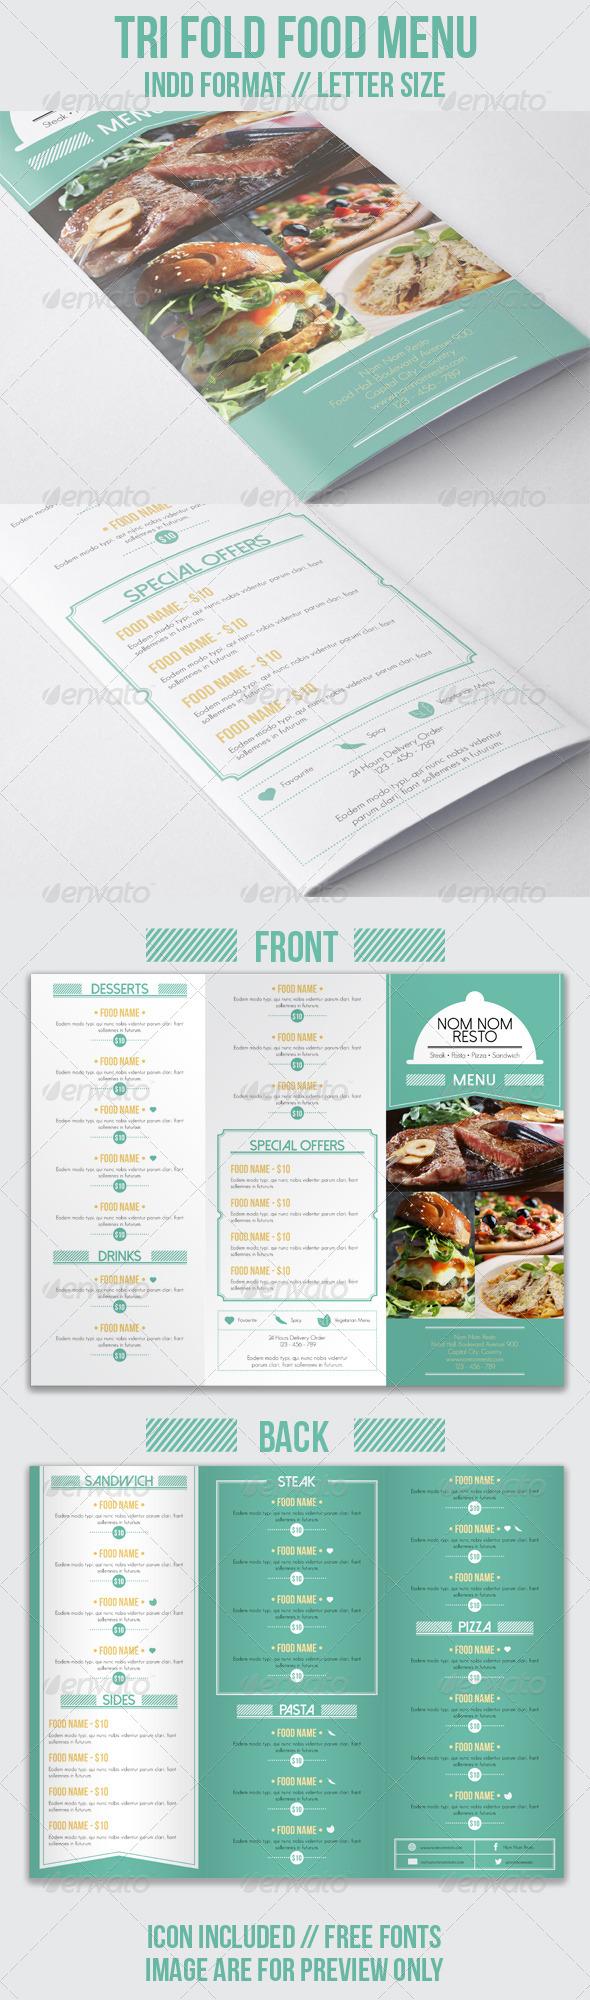 GraphicRiver Tri Fold Food Menu 7518615